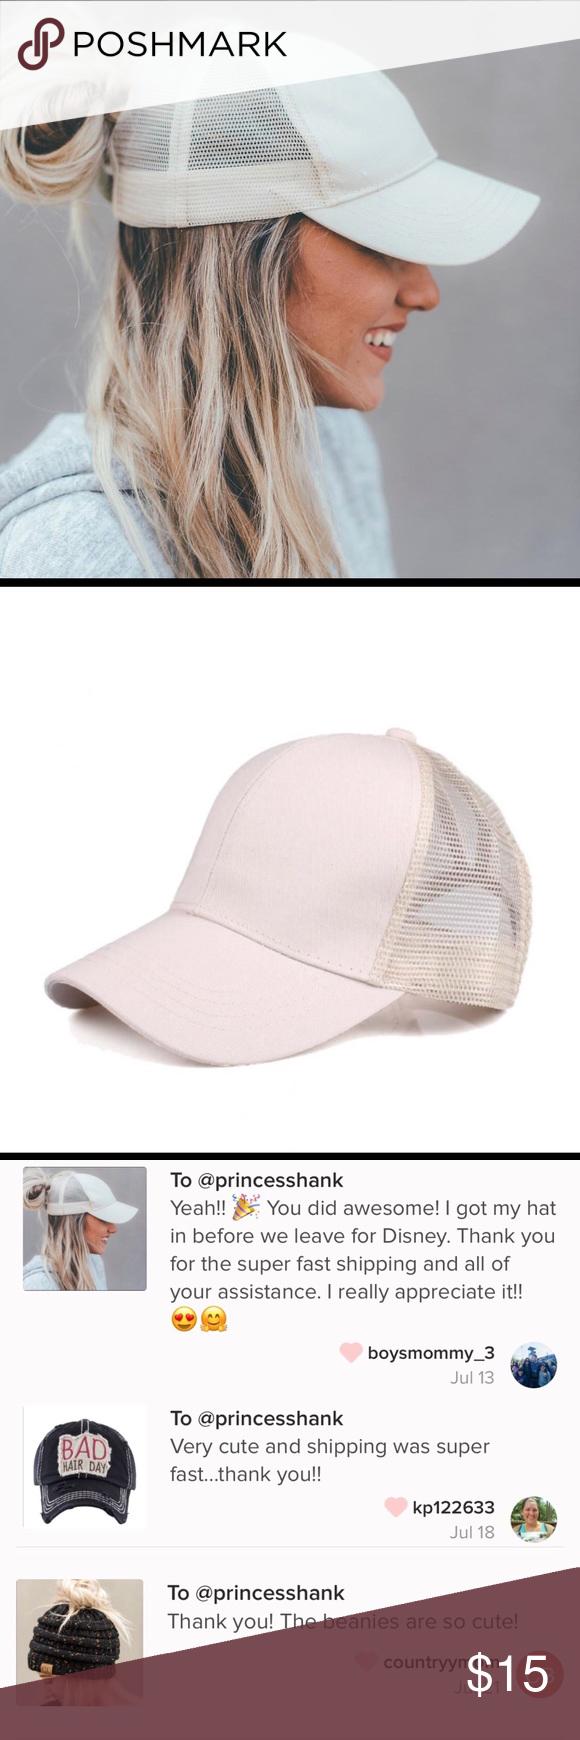 e1151acf798 Beige C.C High Ponytail Baseball Style Cap New CC ponytail hat with mesh  back. Adjustable velcro back with CC leather logo on back.